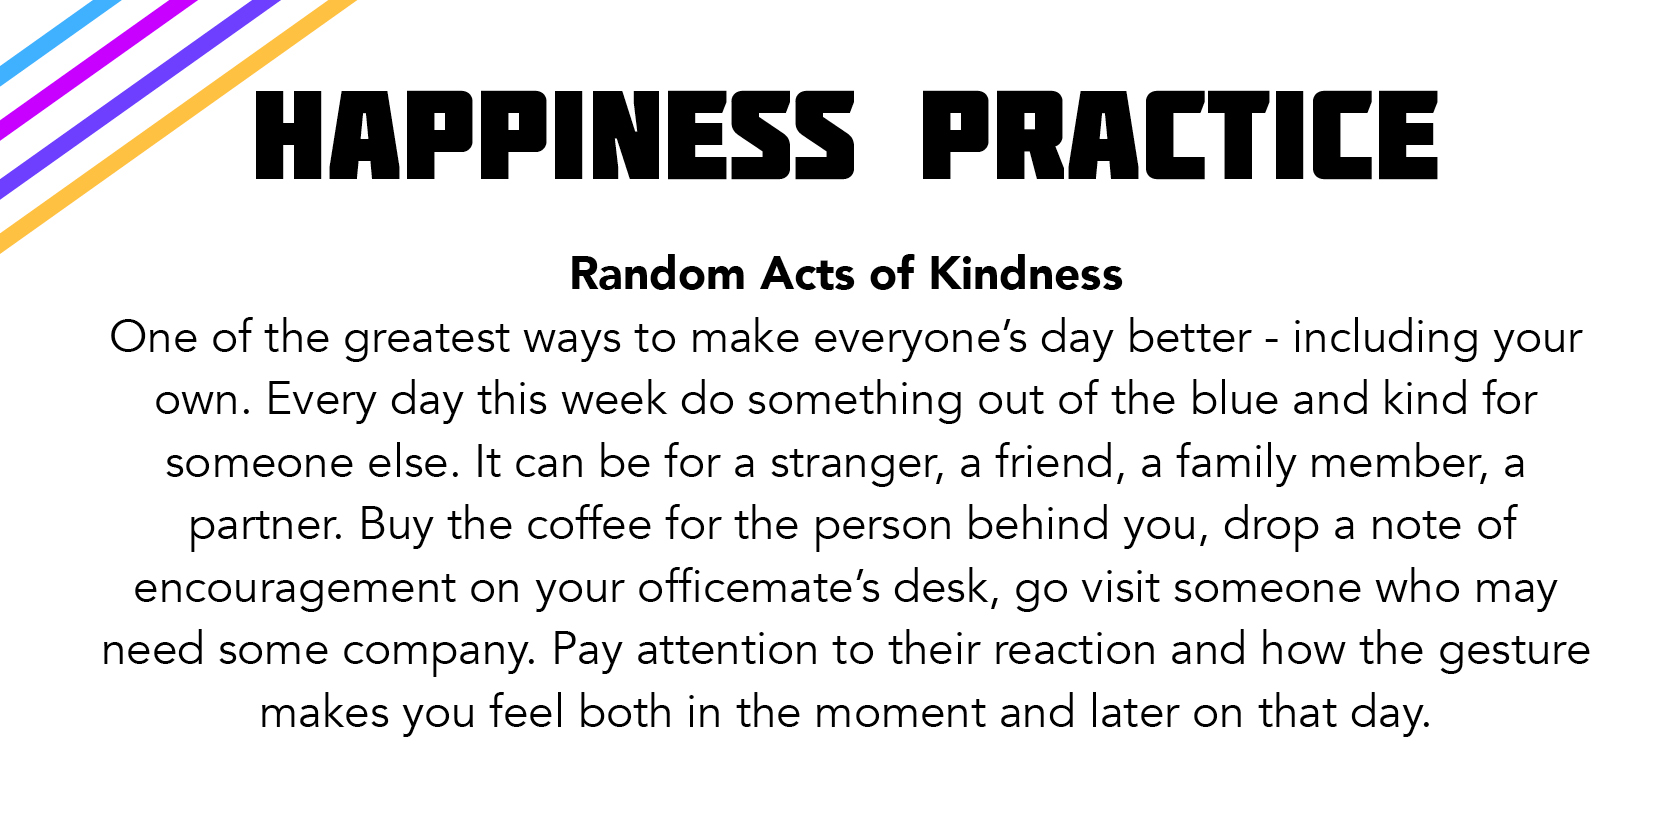 randomeactsof kindness.jpg